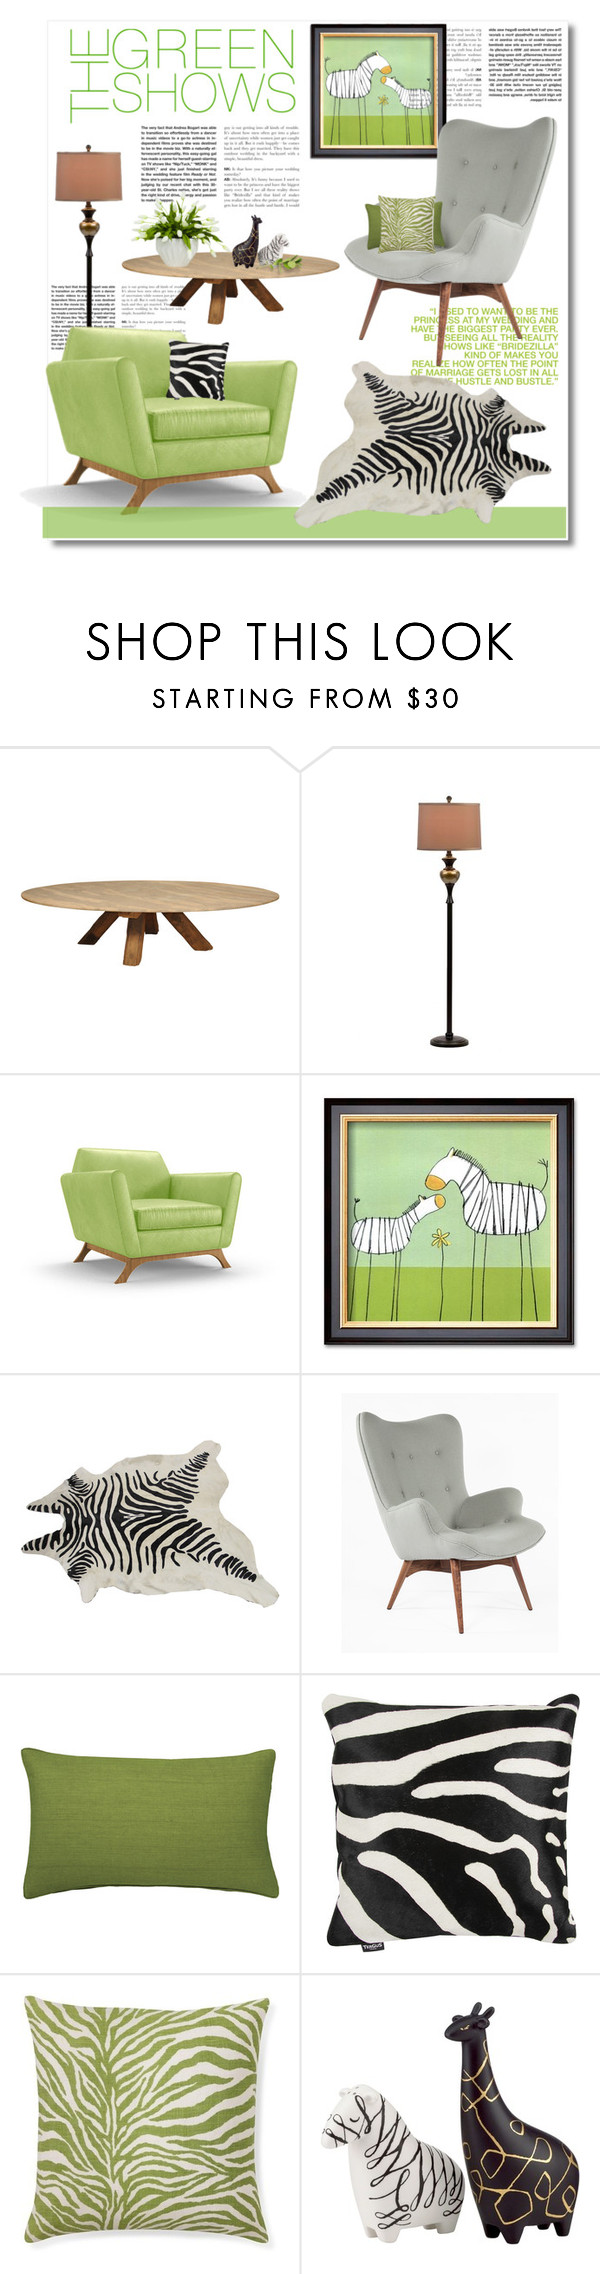 """green zebra"" by limass on Polyvore featuring interior, interiors, interior design, home, home decor, interior decorating, Andrea, Joybird Furniture, Control Brand and OKA"